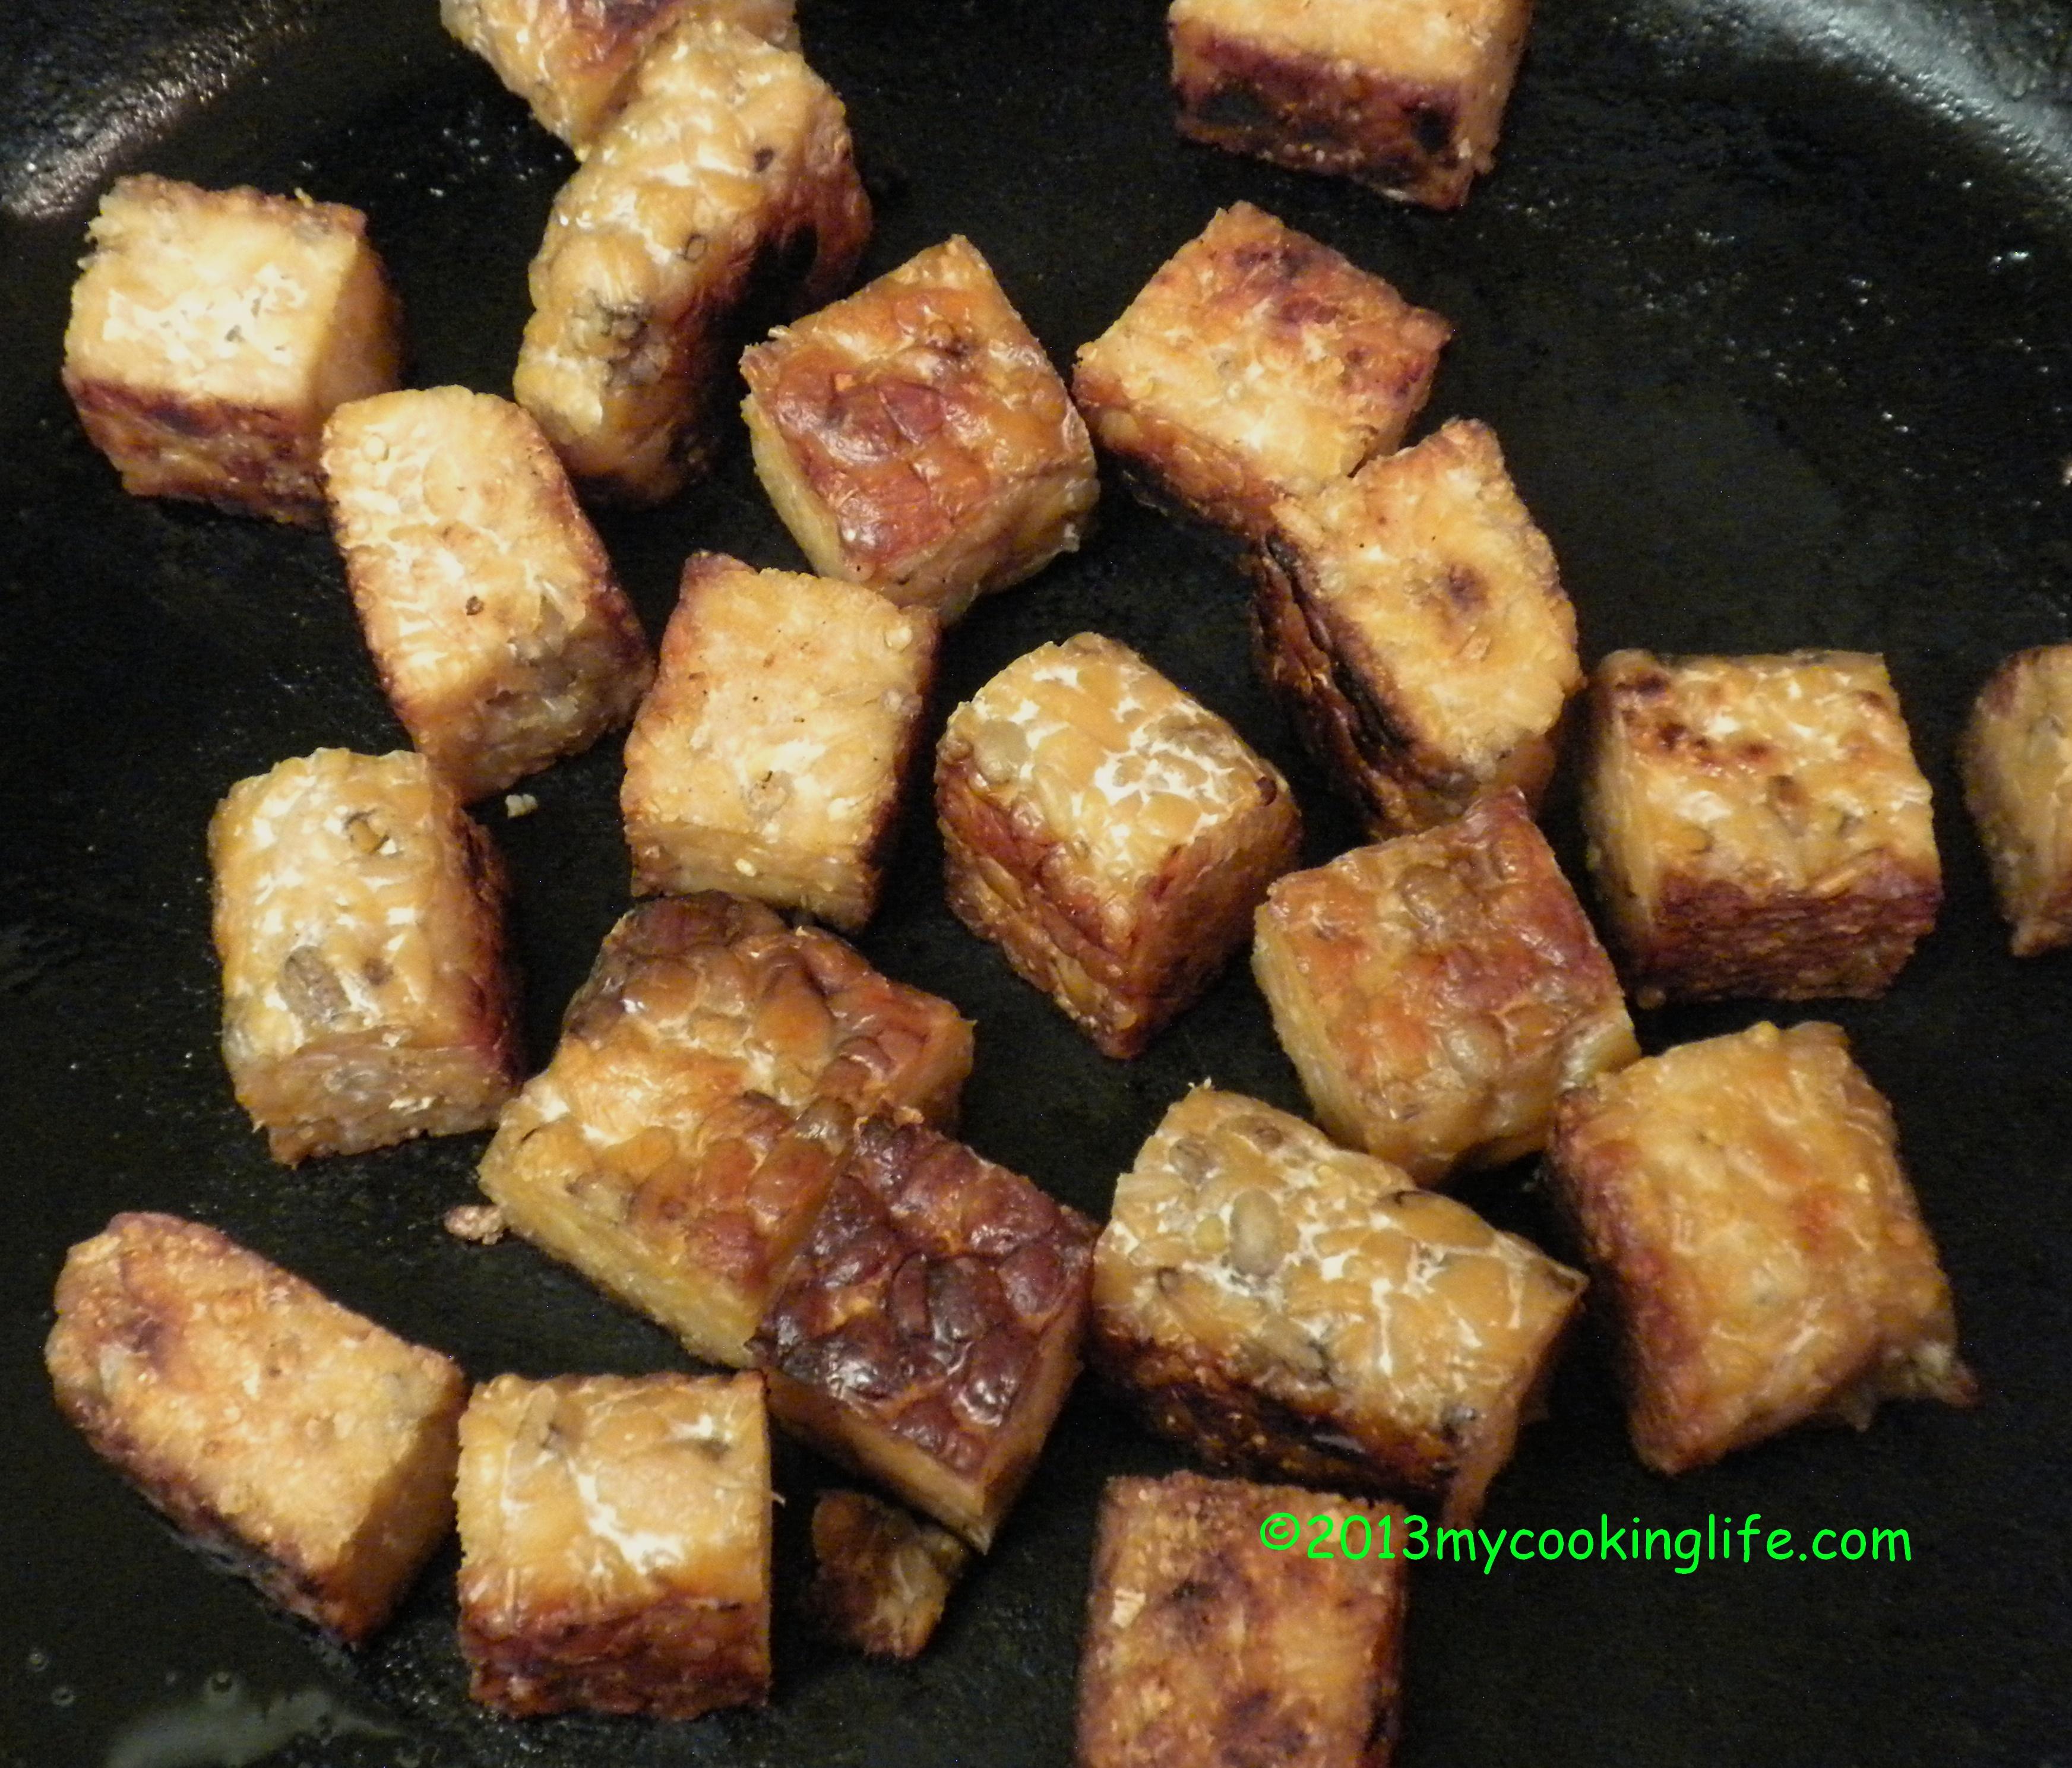 Fried Tempeh Calories